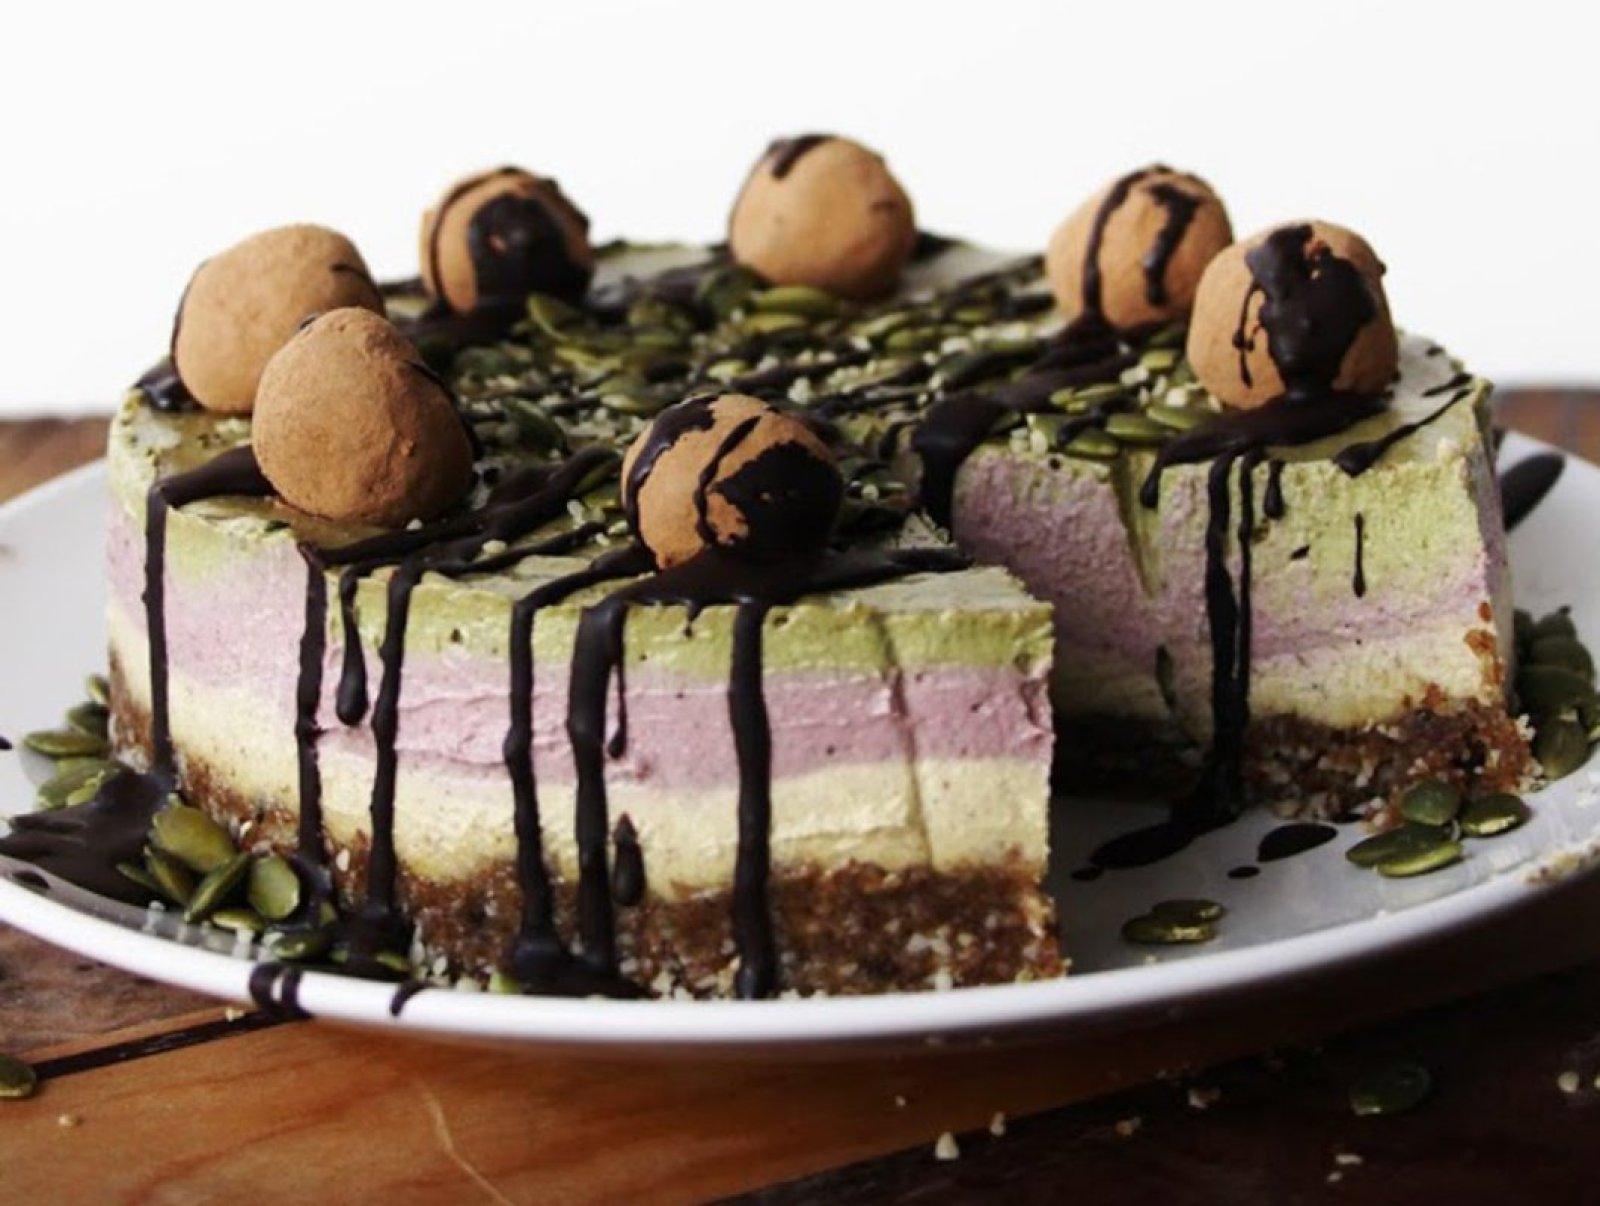 Vegan Raw Vanilla Raspberry Peppermint Cream Cake Topped With Truffles